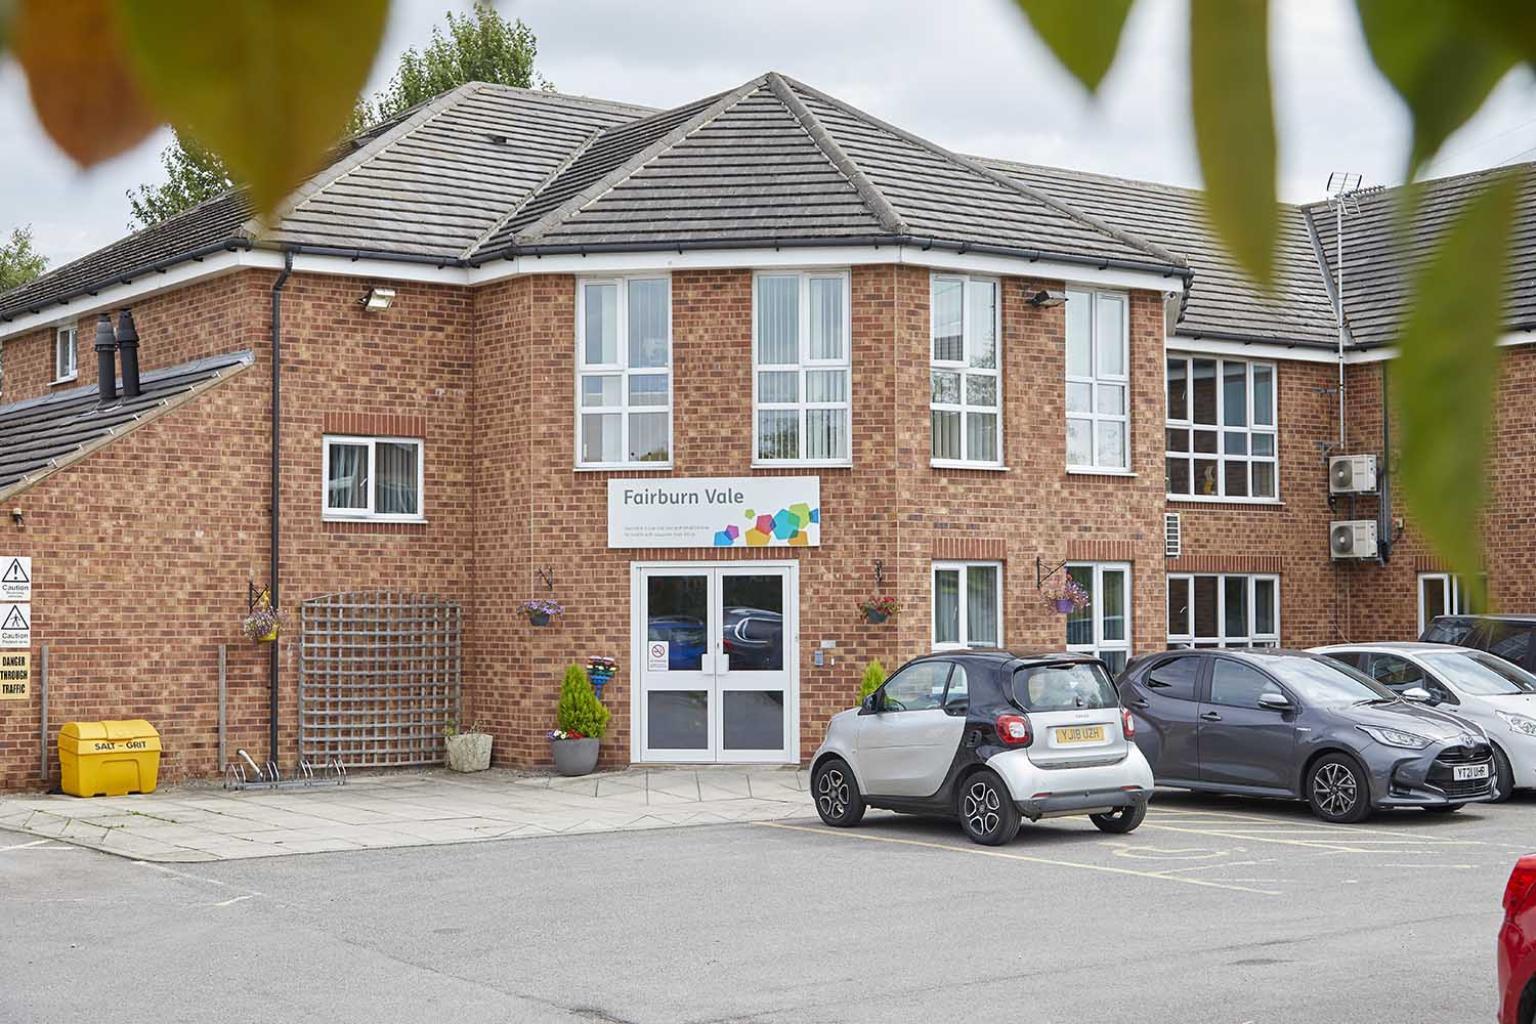 Fairburn Vale care home